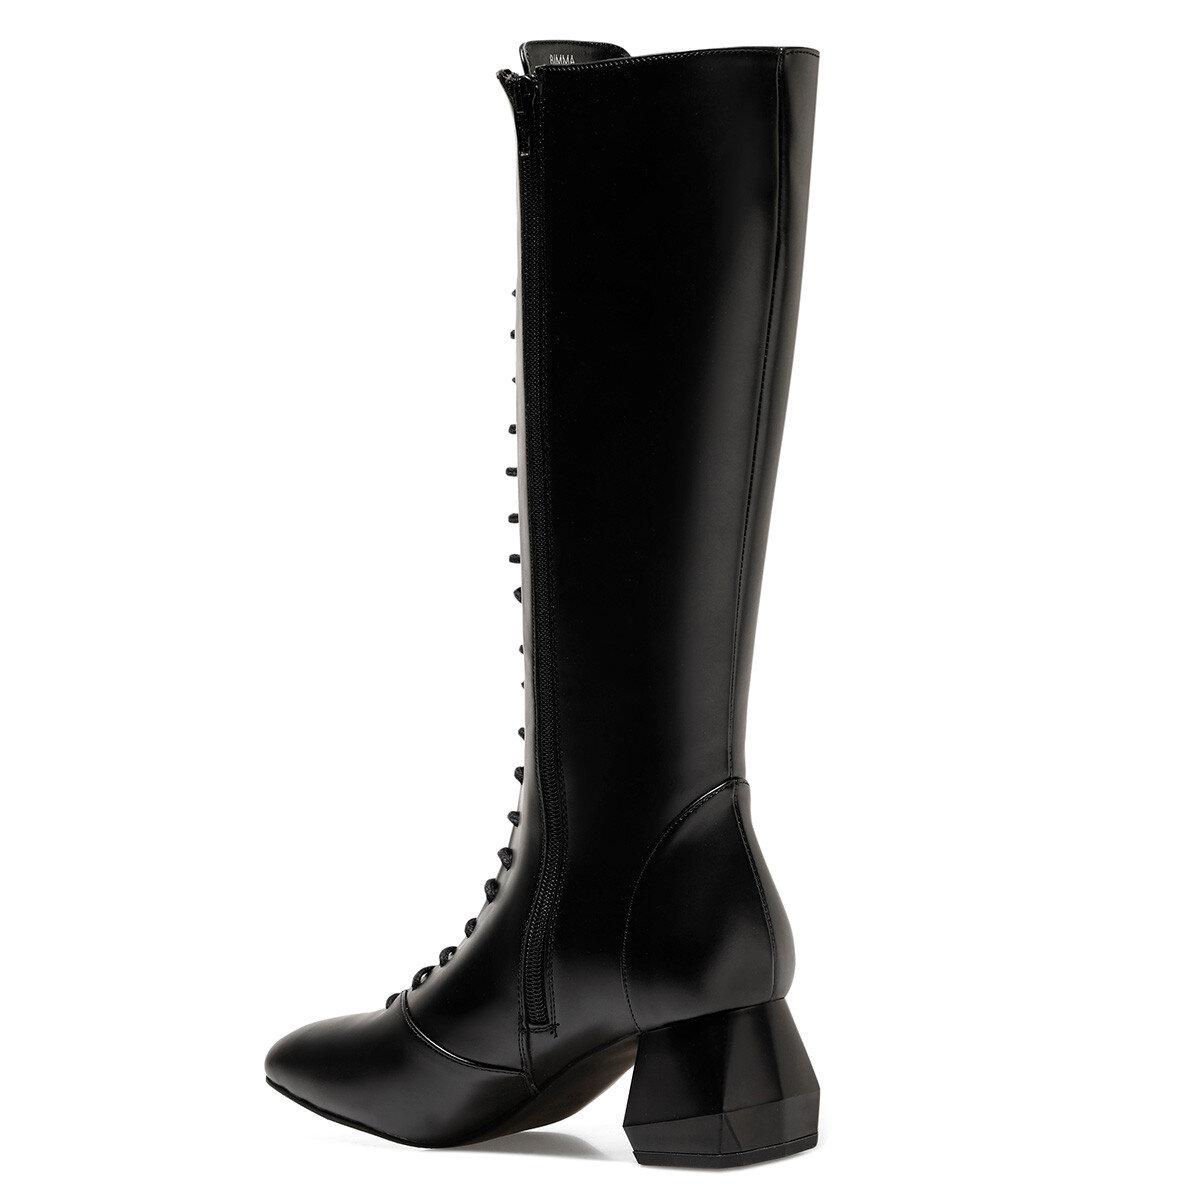 BIMMA Siyah Kadın Topuklu Çizme